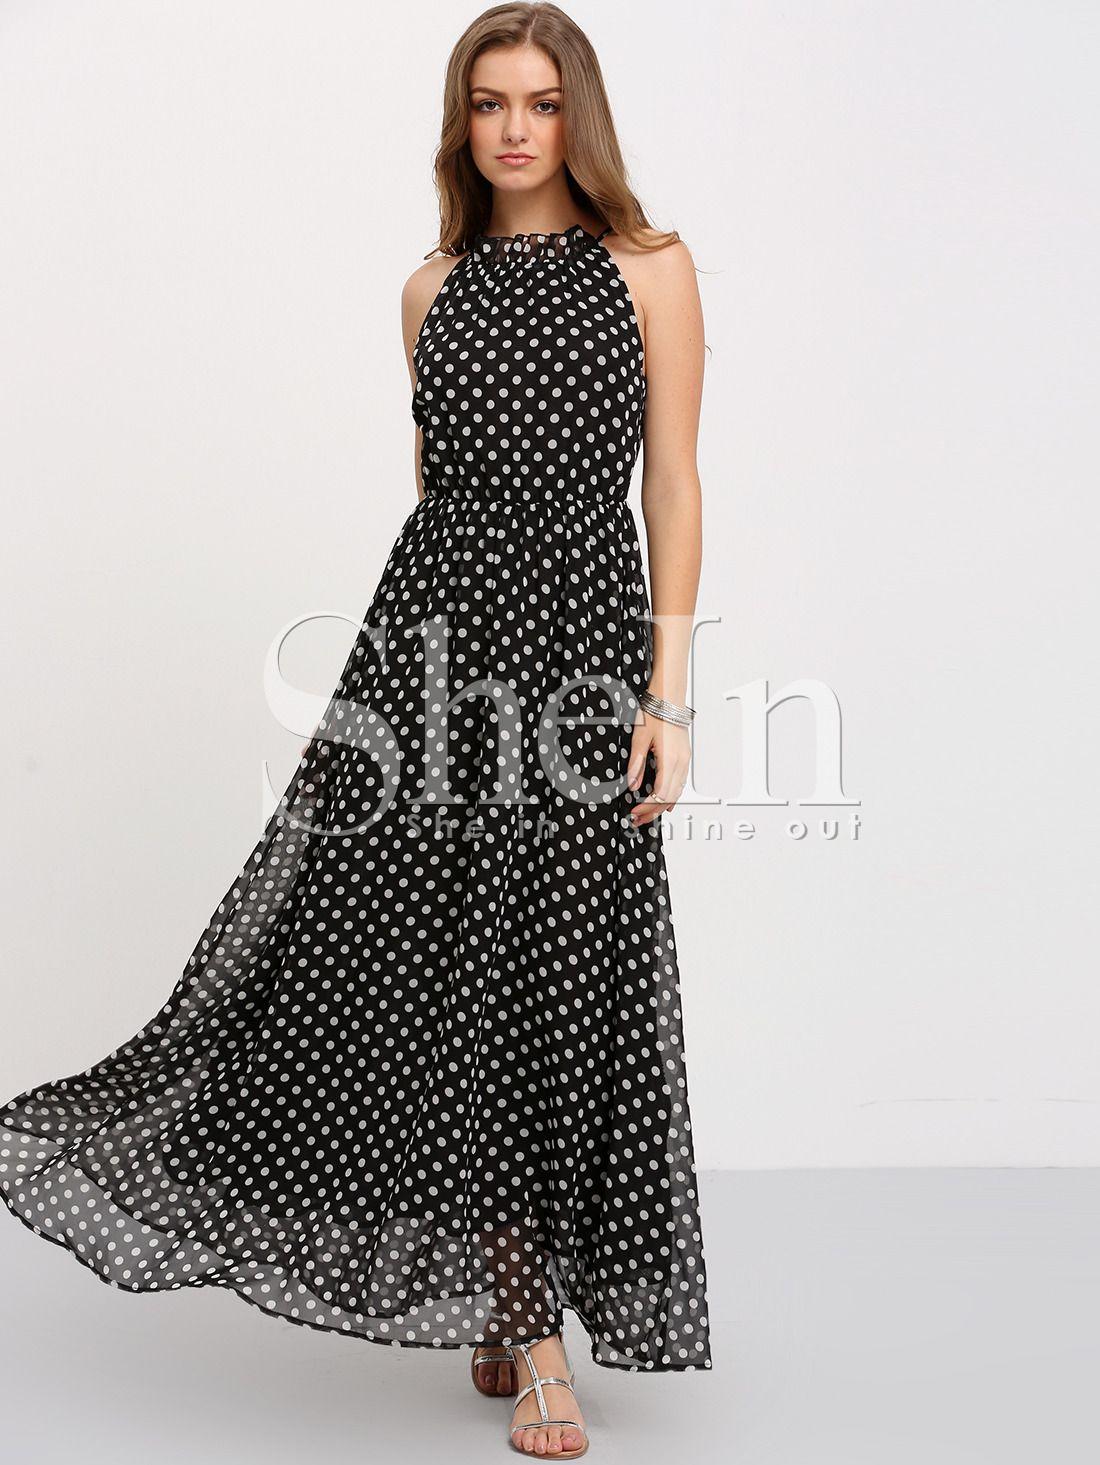 Black Sleeveless Polka Dot Maxi Dress Shein Sheinside Maxi Dress Polka Dot Maxi Dresses Gorgeous Dresses [ 1465 x 1100 Pixel ]